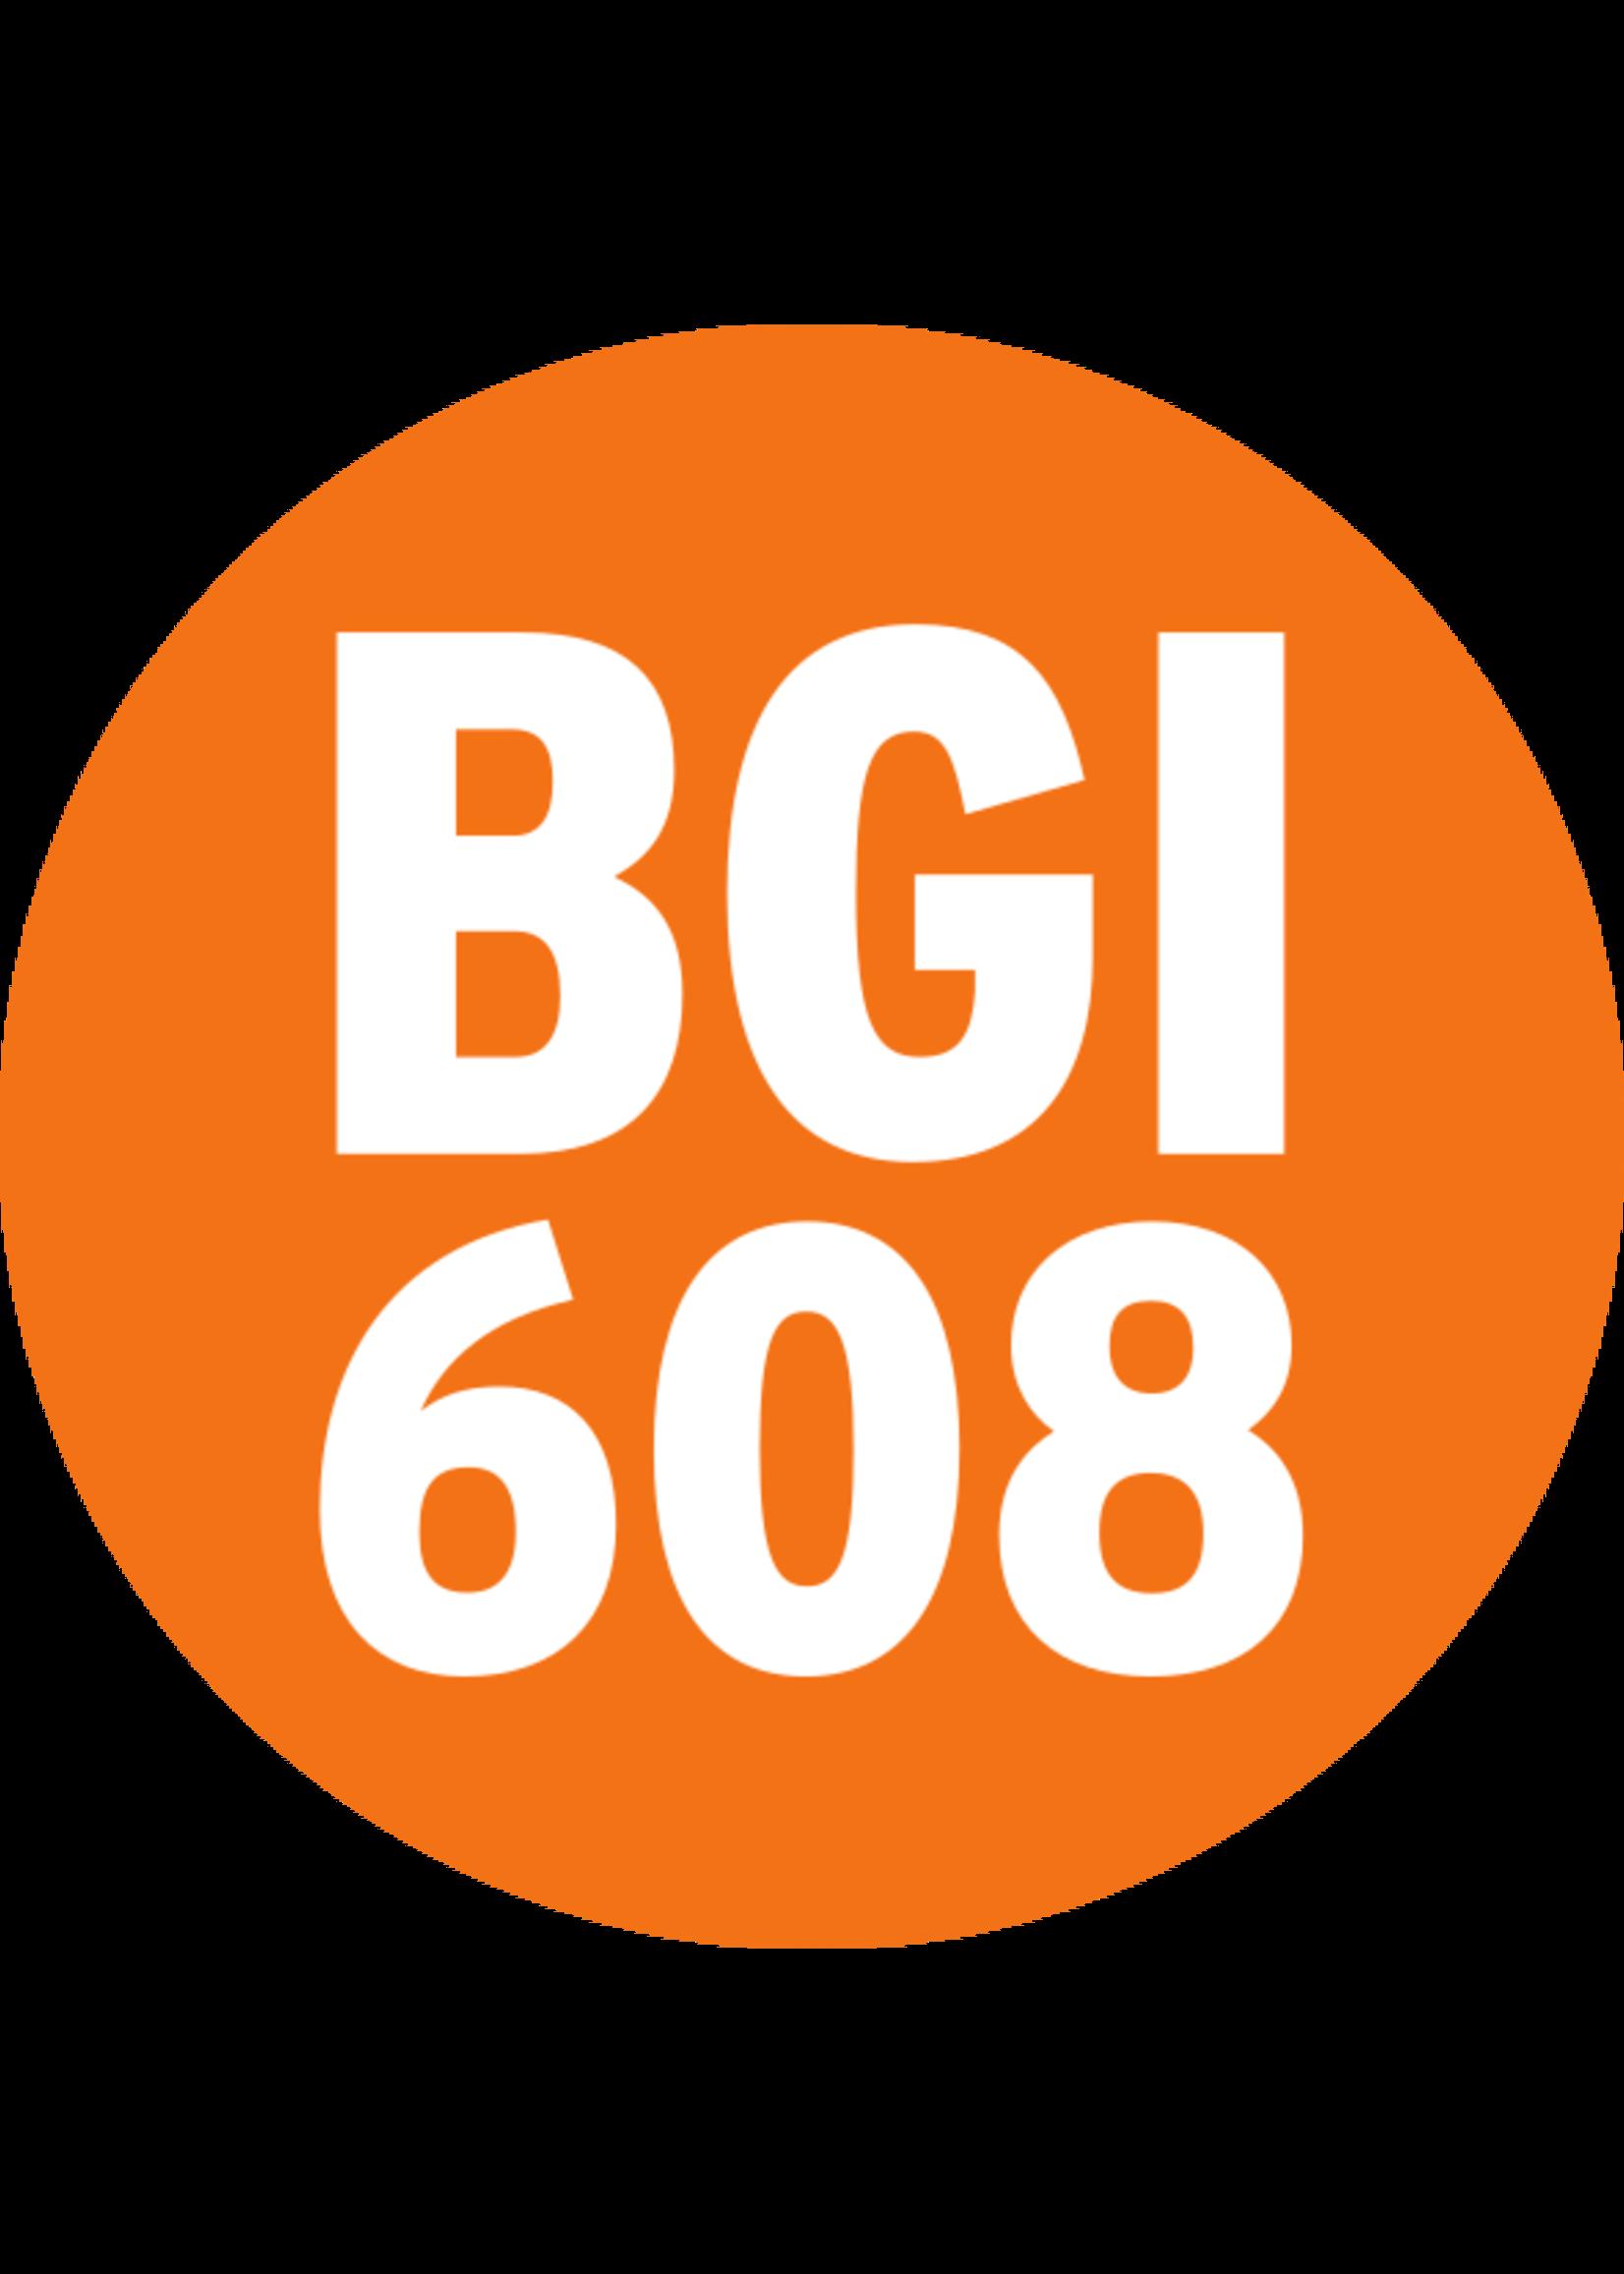 Brennenstuhl Brennenstuhl ProfessionalLINE 9161100200 Verlengkabel - IP44 - H07BQ-F3G1.5 - 10m - Oranje